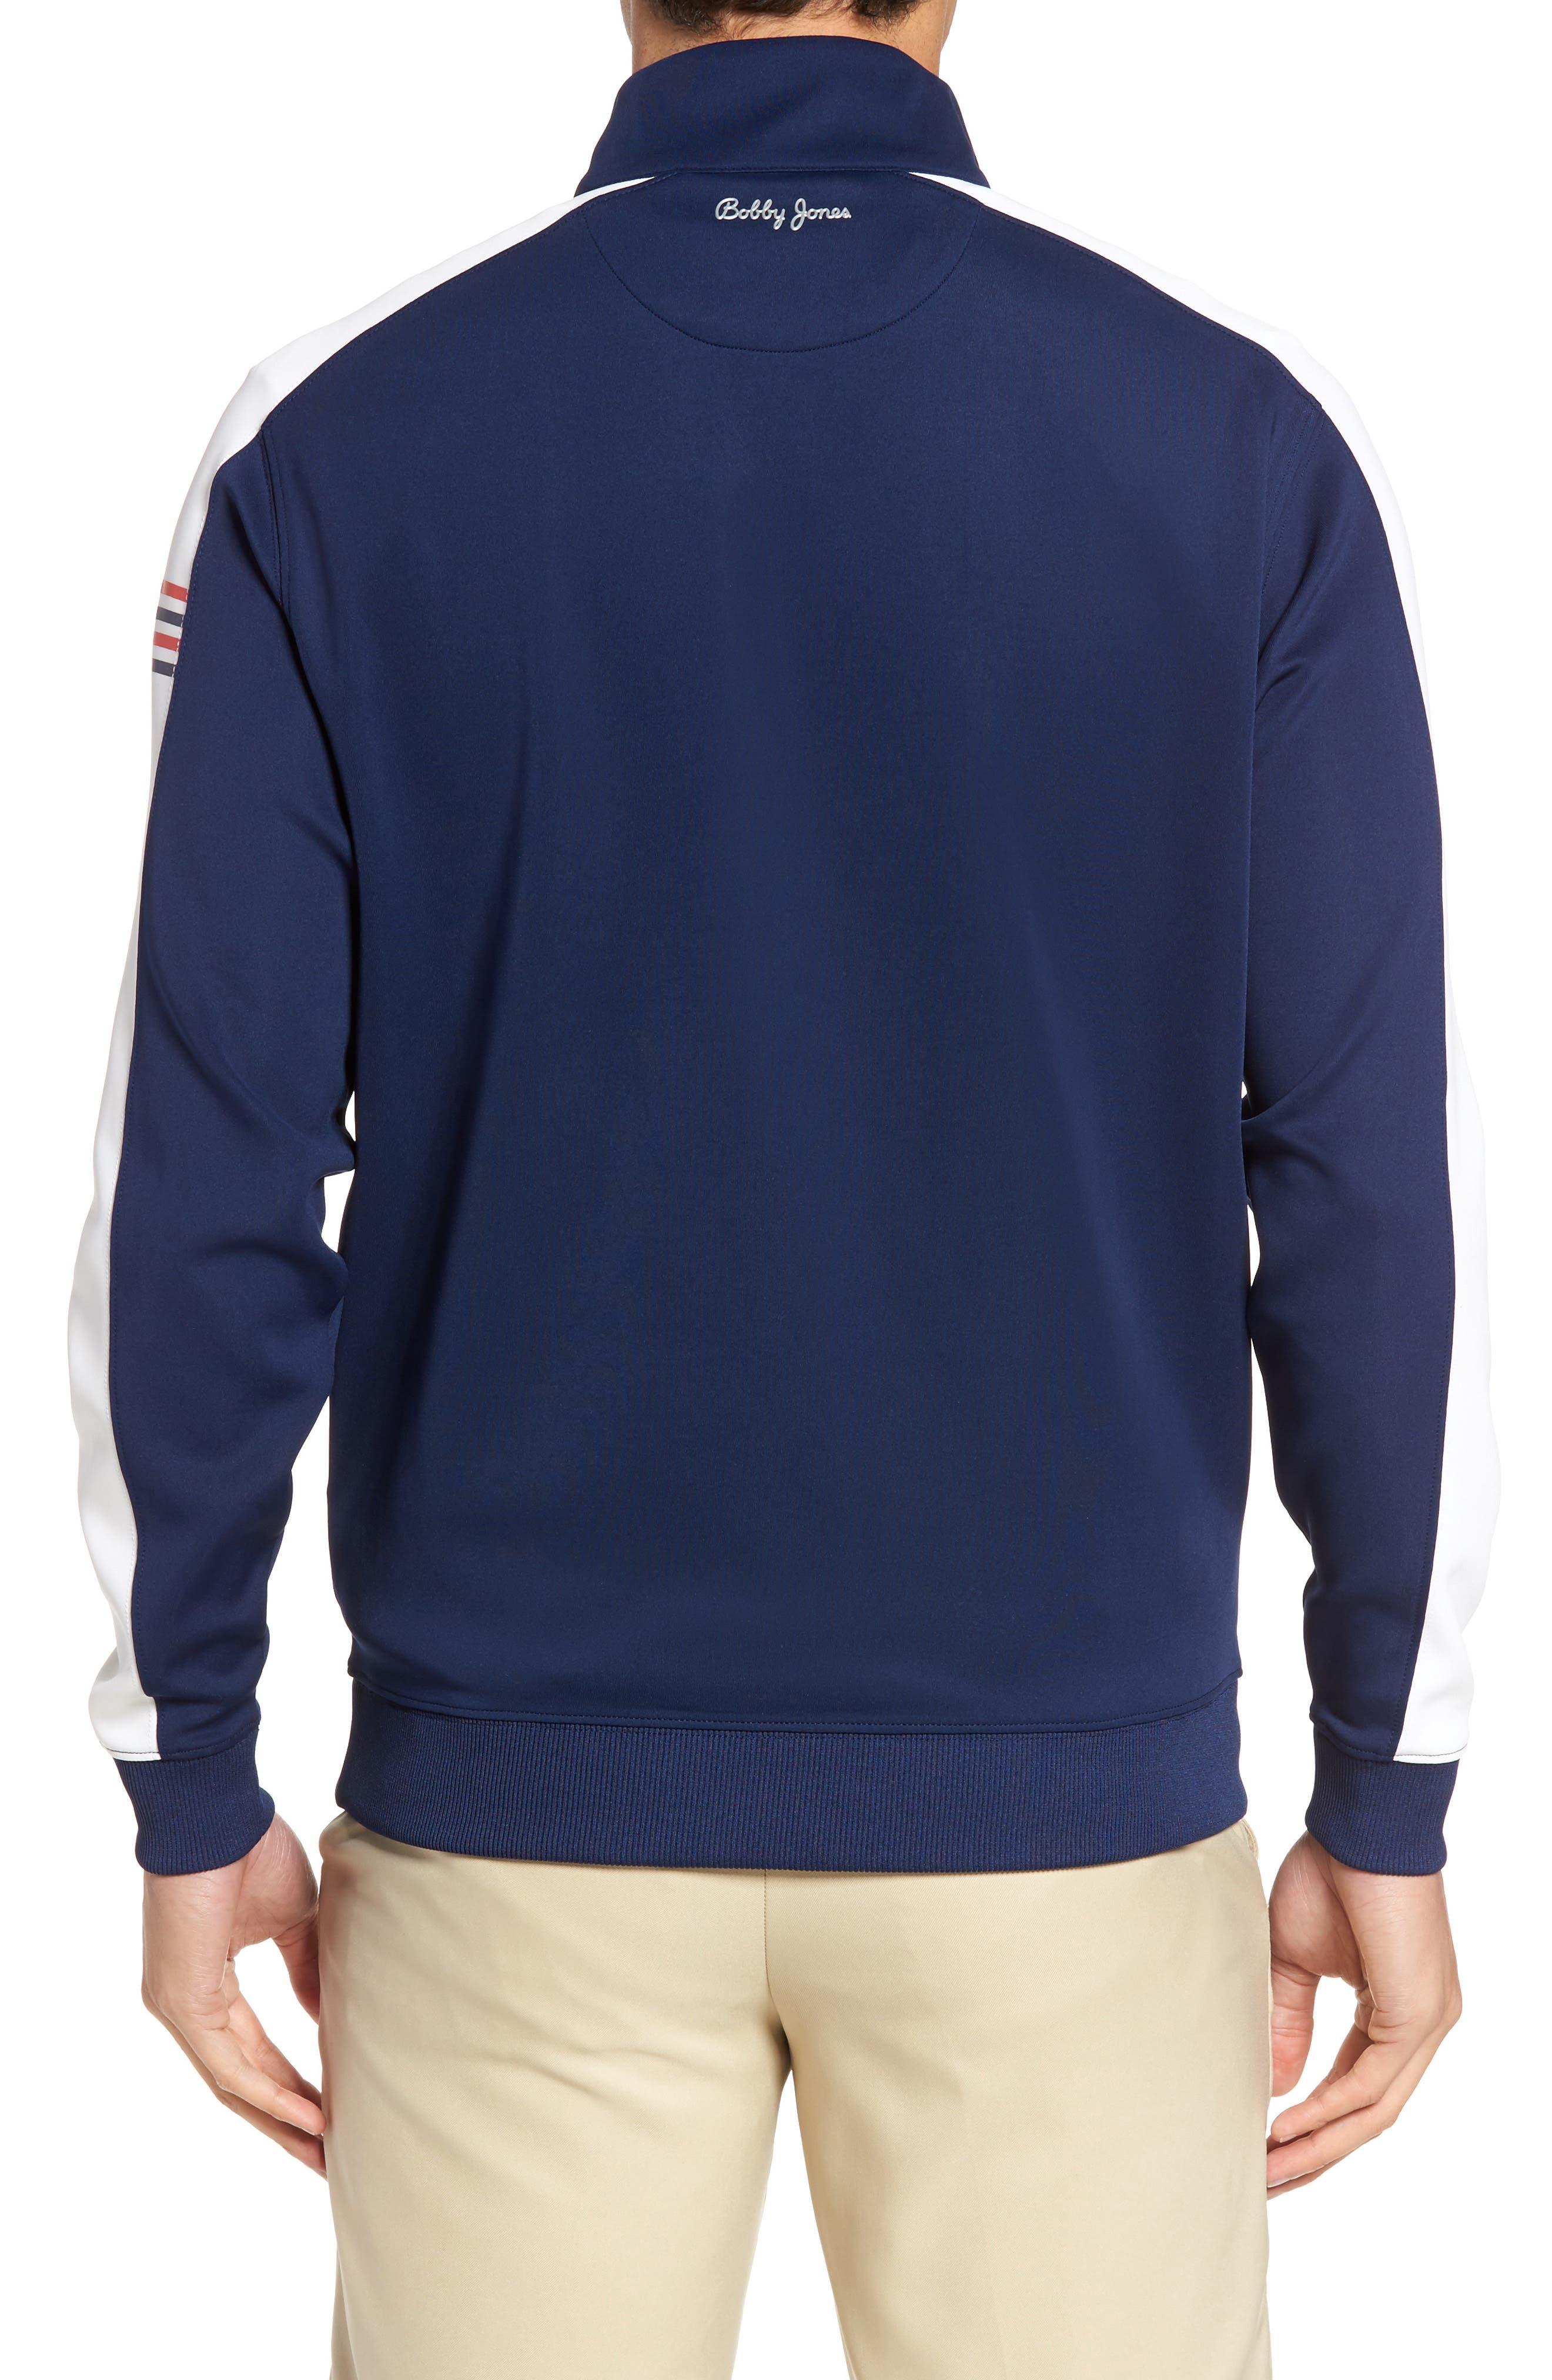 Alternate Image 2  - Bobby Jones XH20 Tech Quarter Zip Sweater